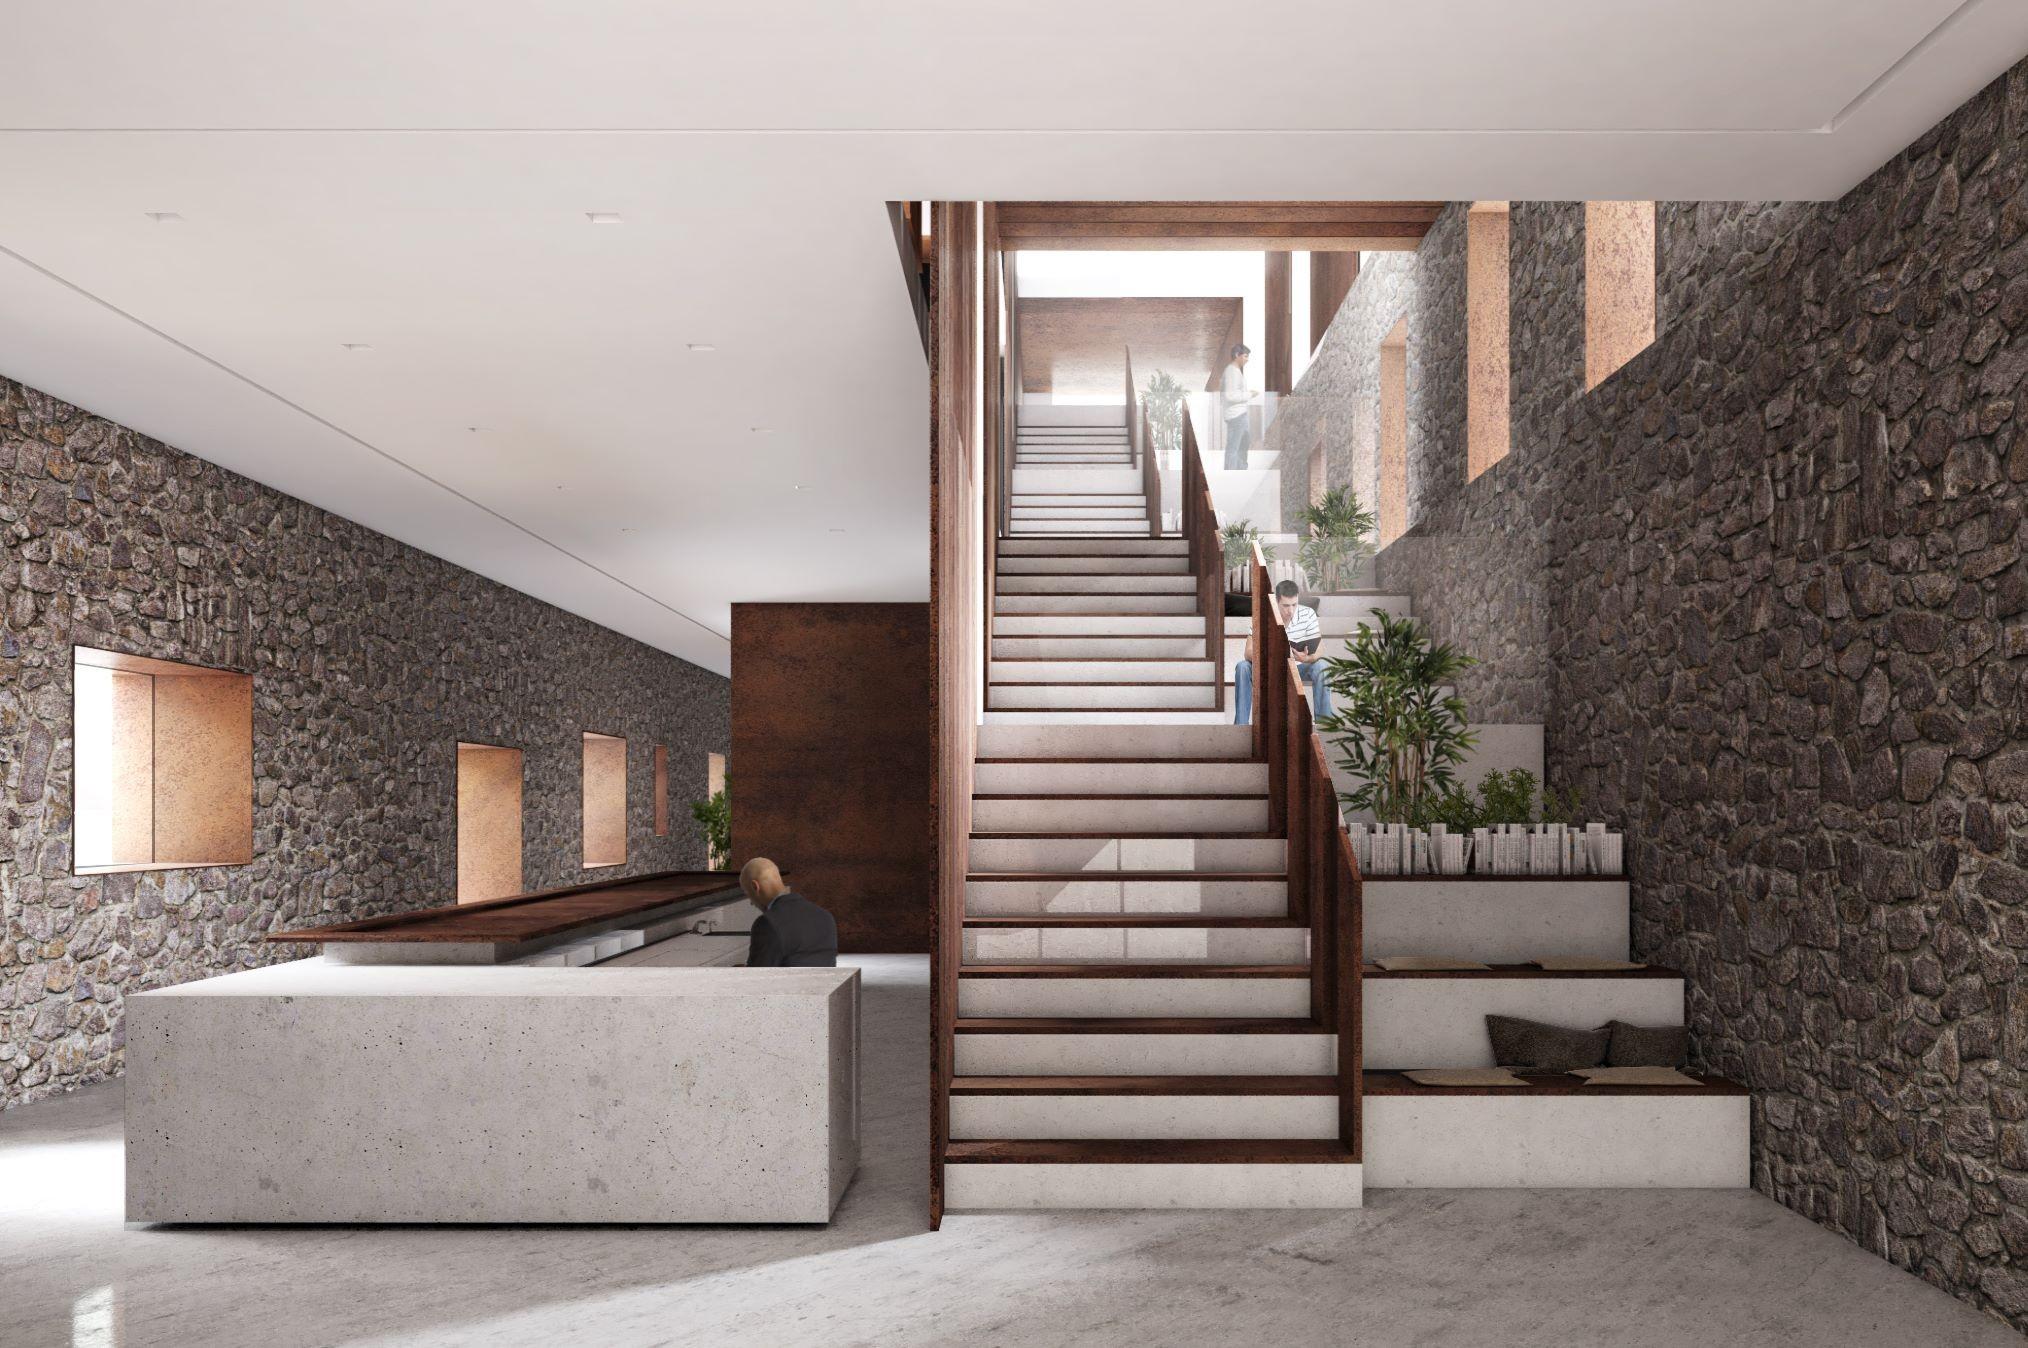 Estudio de Arquitectura: BAT crea proyectos lujuosos y poderosos en Bilbao estudio de arquitectura Estudio de Arquitectura: BAT crea proyectos lujuosos y poderosos en Bilbao 22519871 1513539685393227 6044717275695602569 o